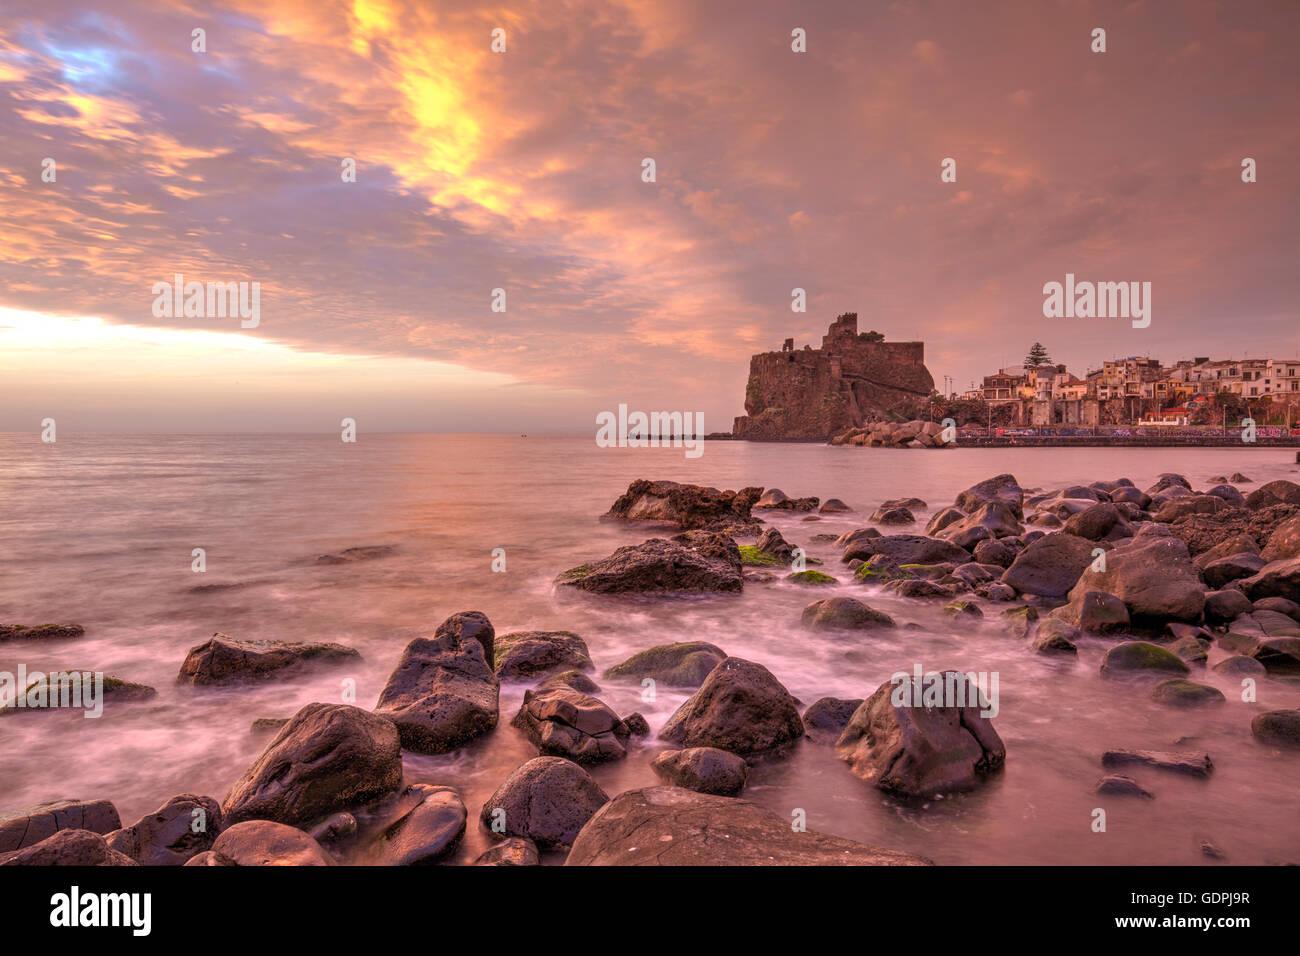 The Norman Castle of Aci Castello, Sicily, Italy - Stock Image